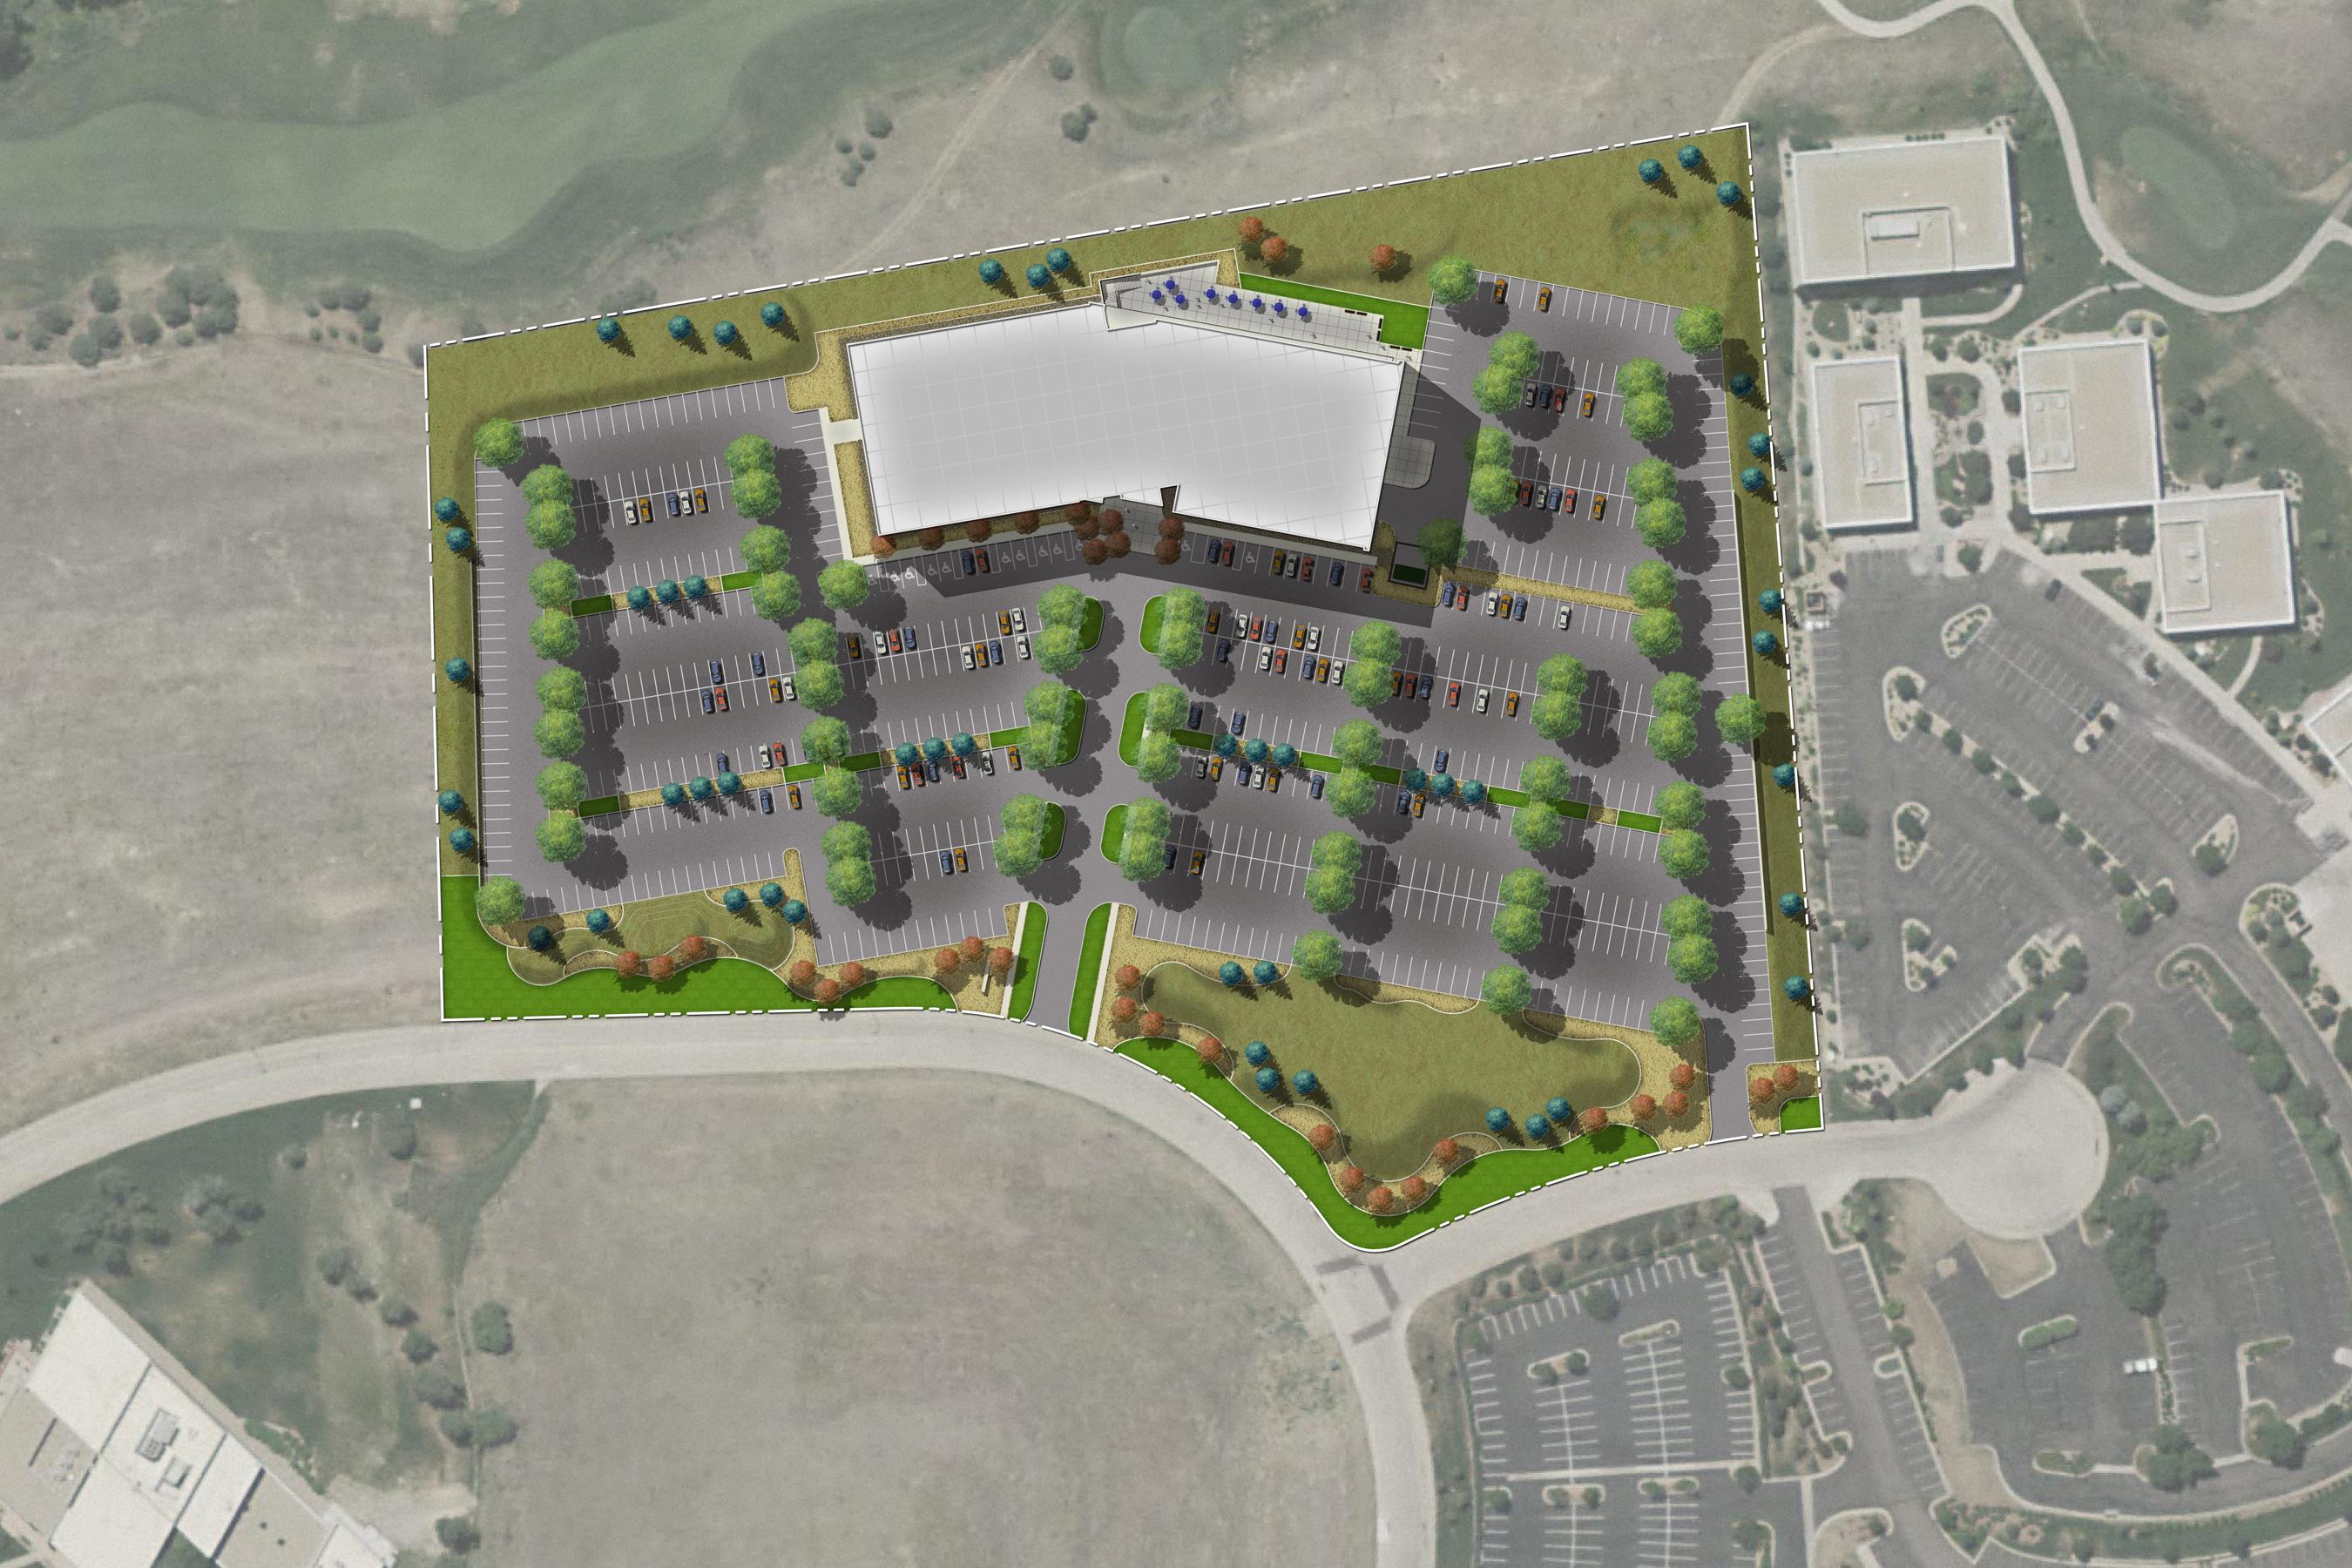 003 open studio architecture Trizetto Site Plan OSA